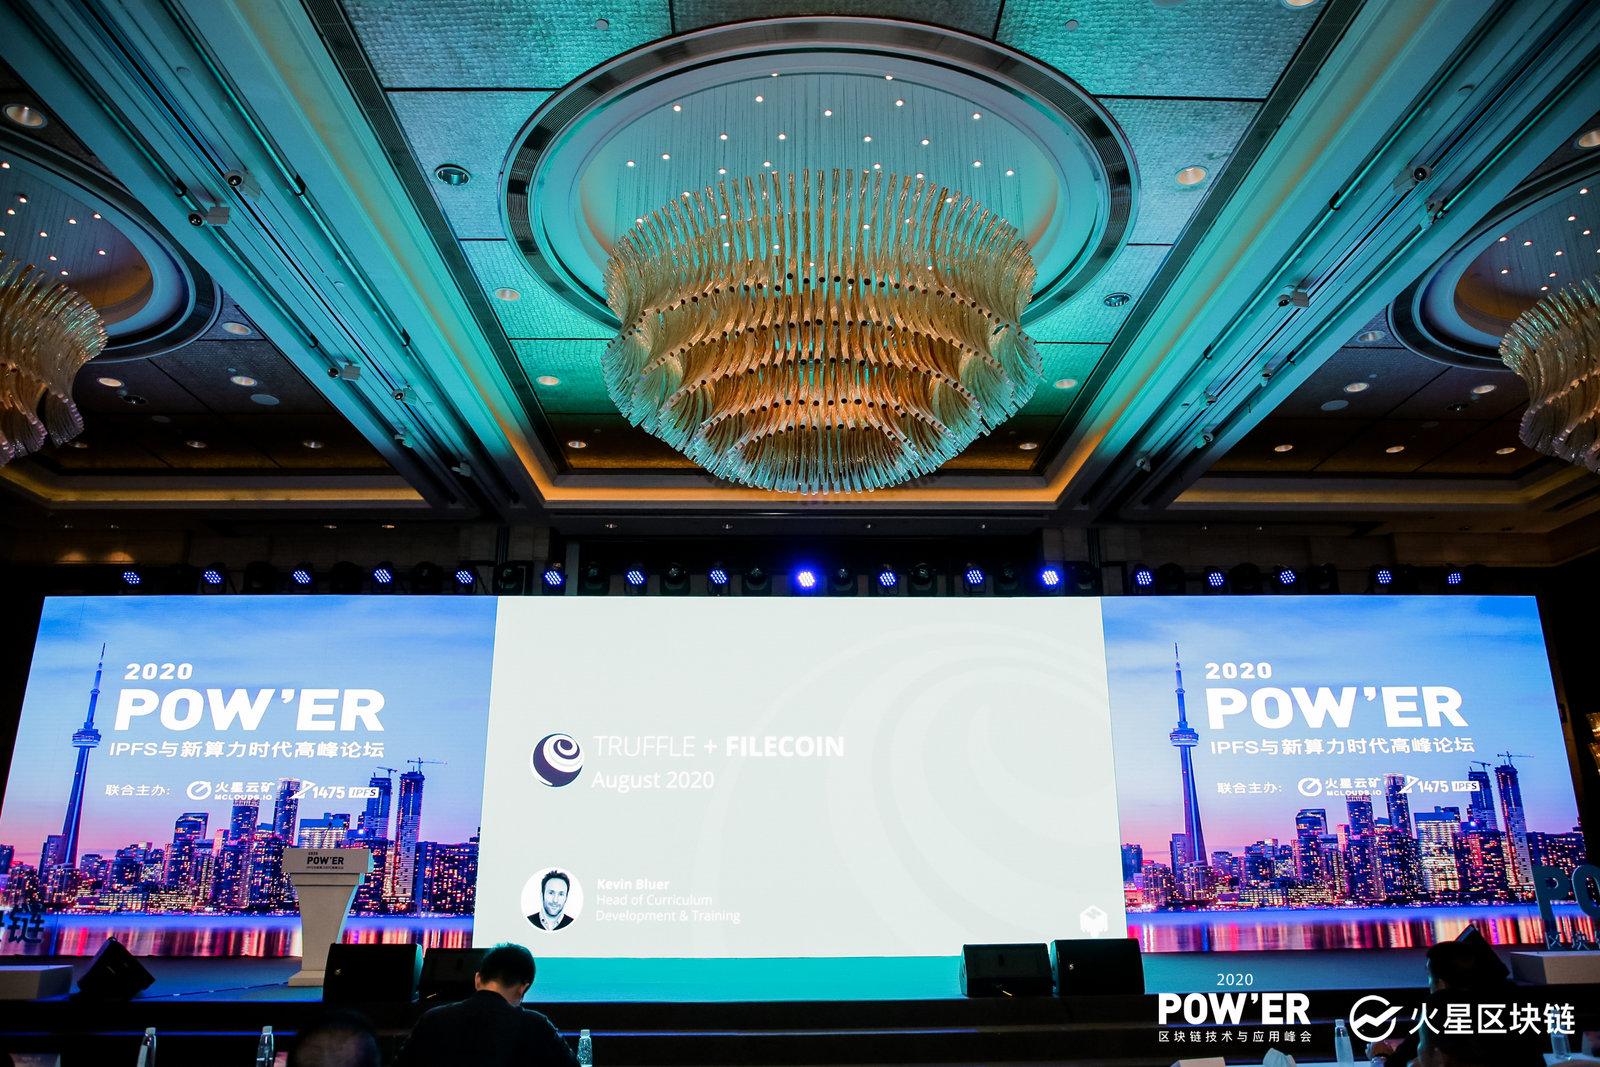 「POW'ER 2020 IPFS与新算力时代高峰论坛」闪电路演,关注IPFS生态建设